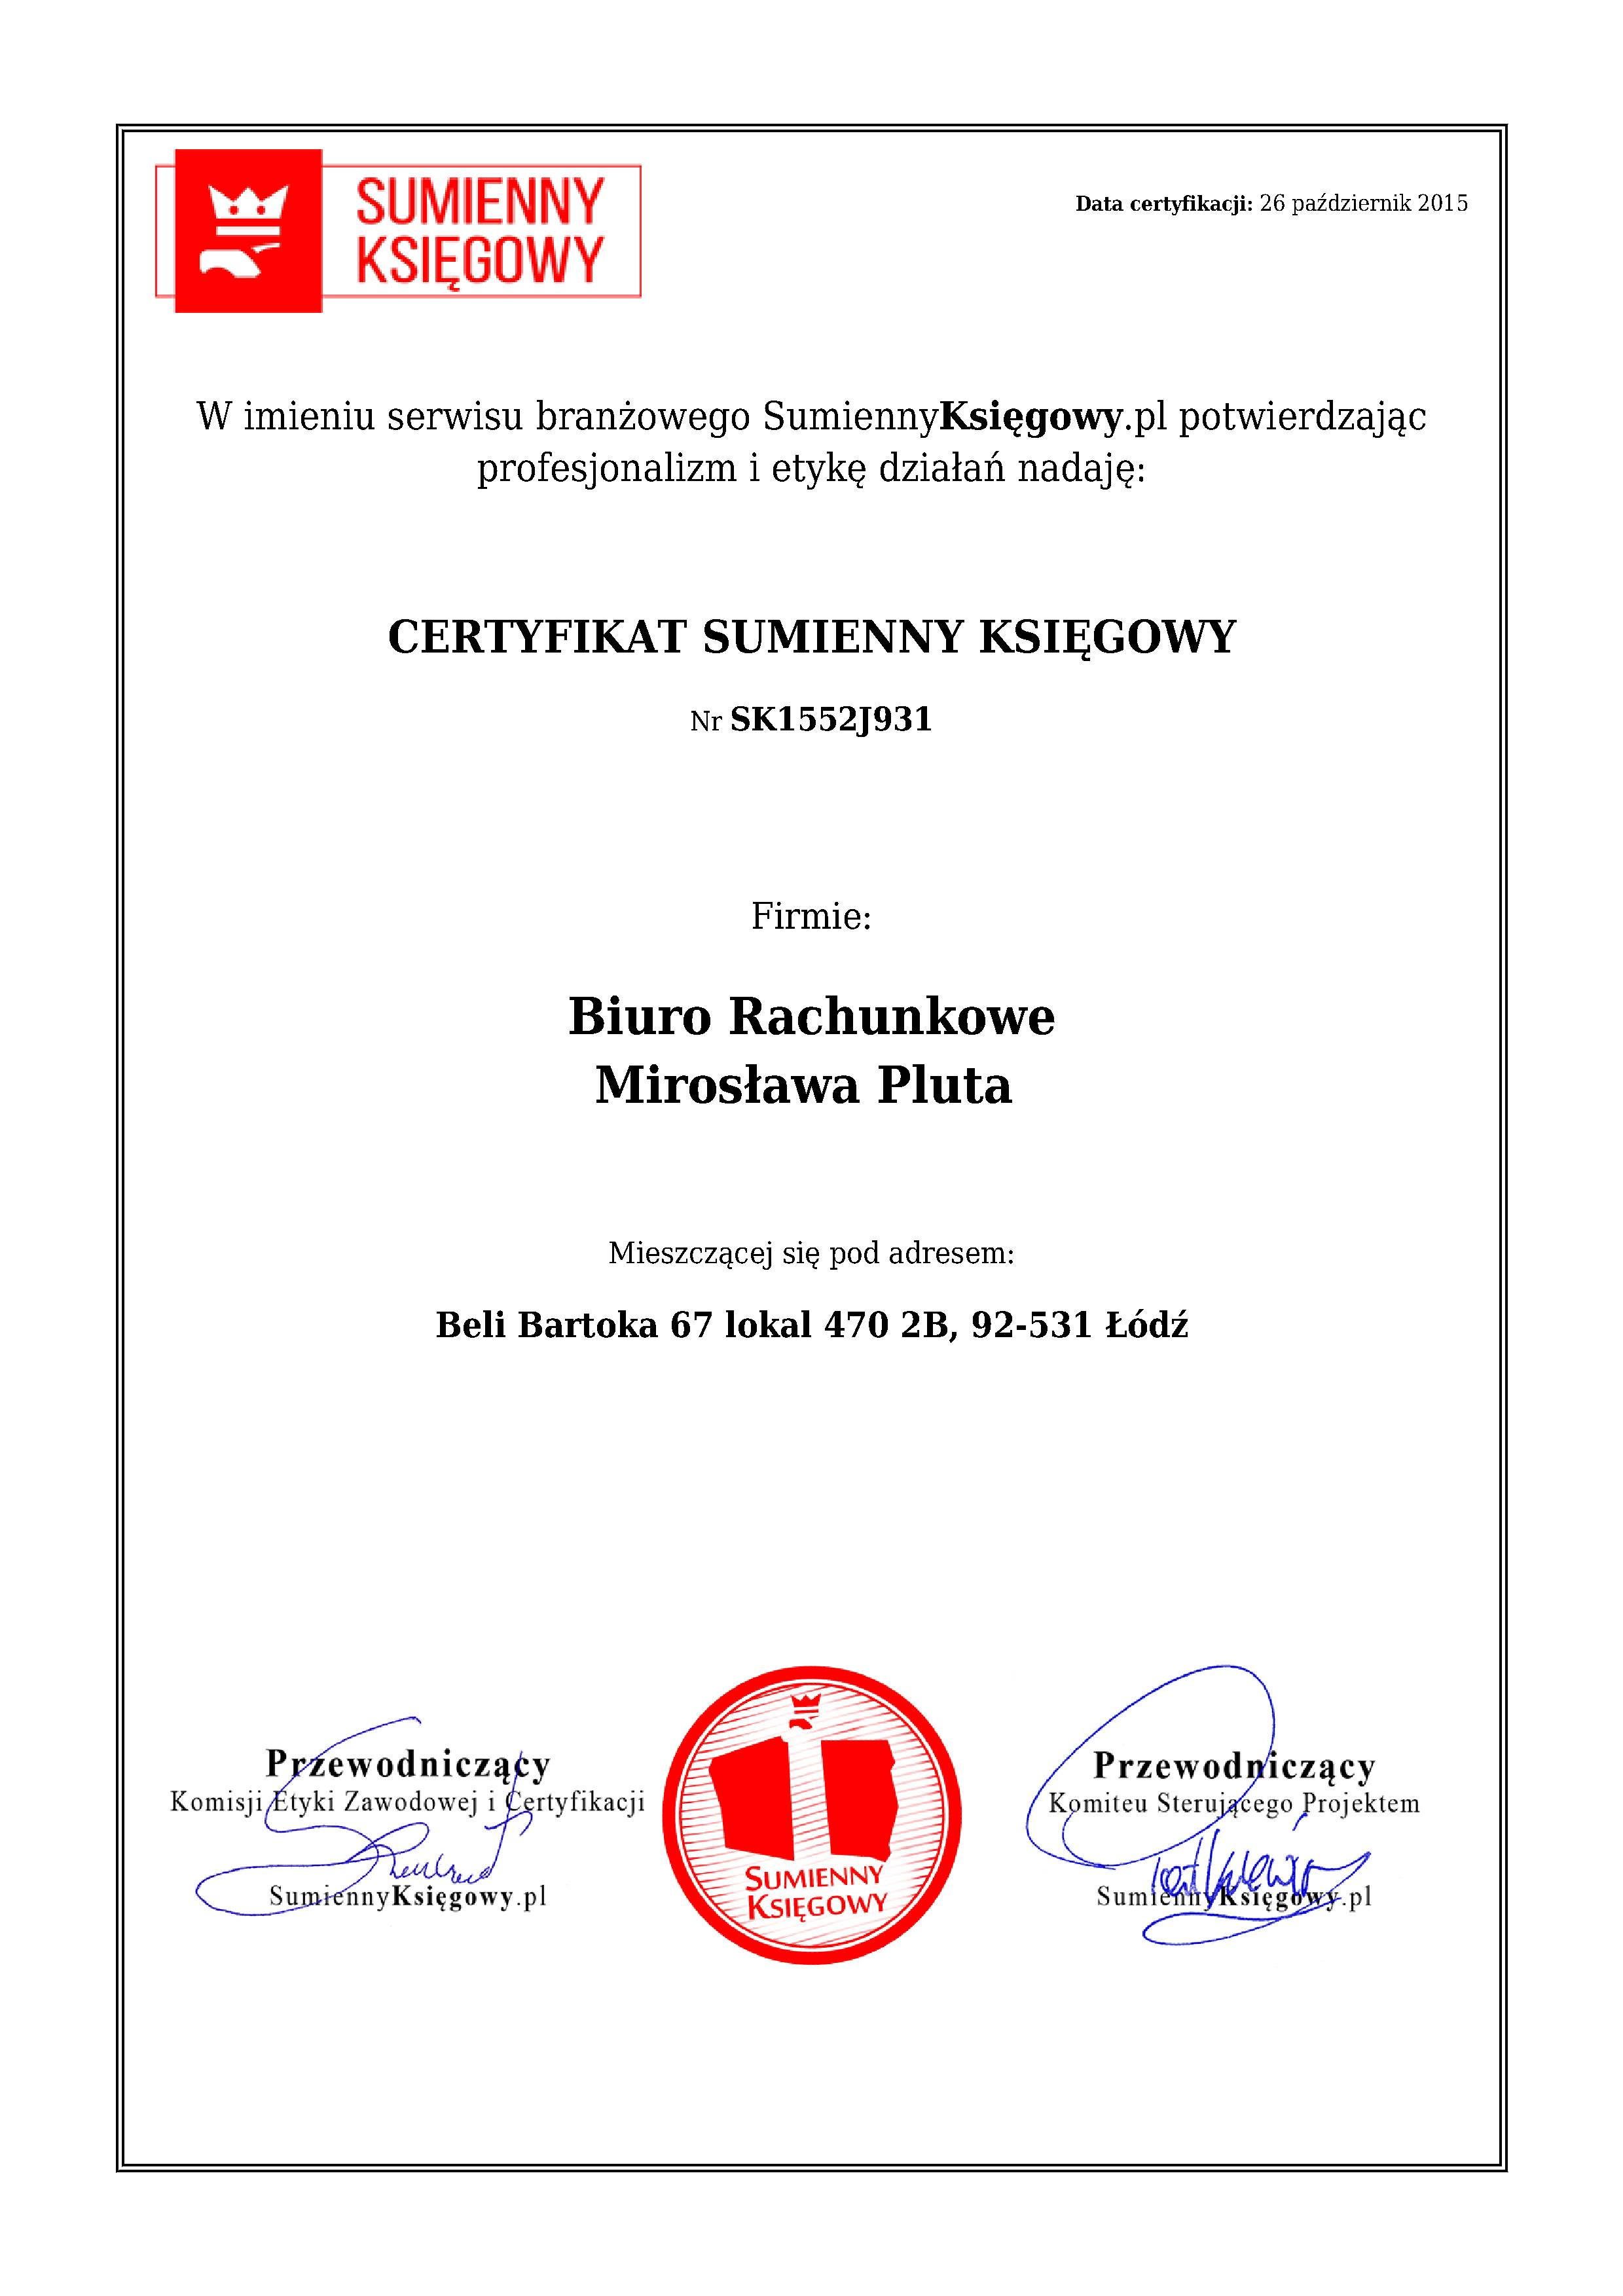 Certyfikat Biuro Rachunkowe Mirosława Pluta